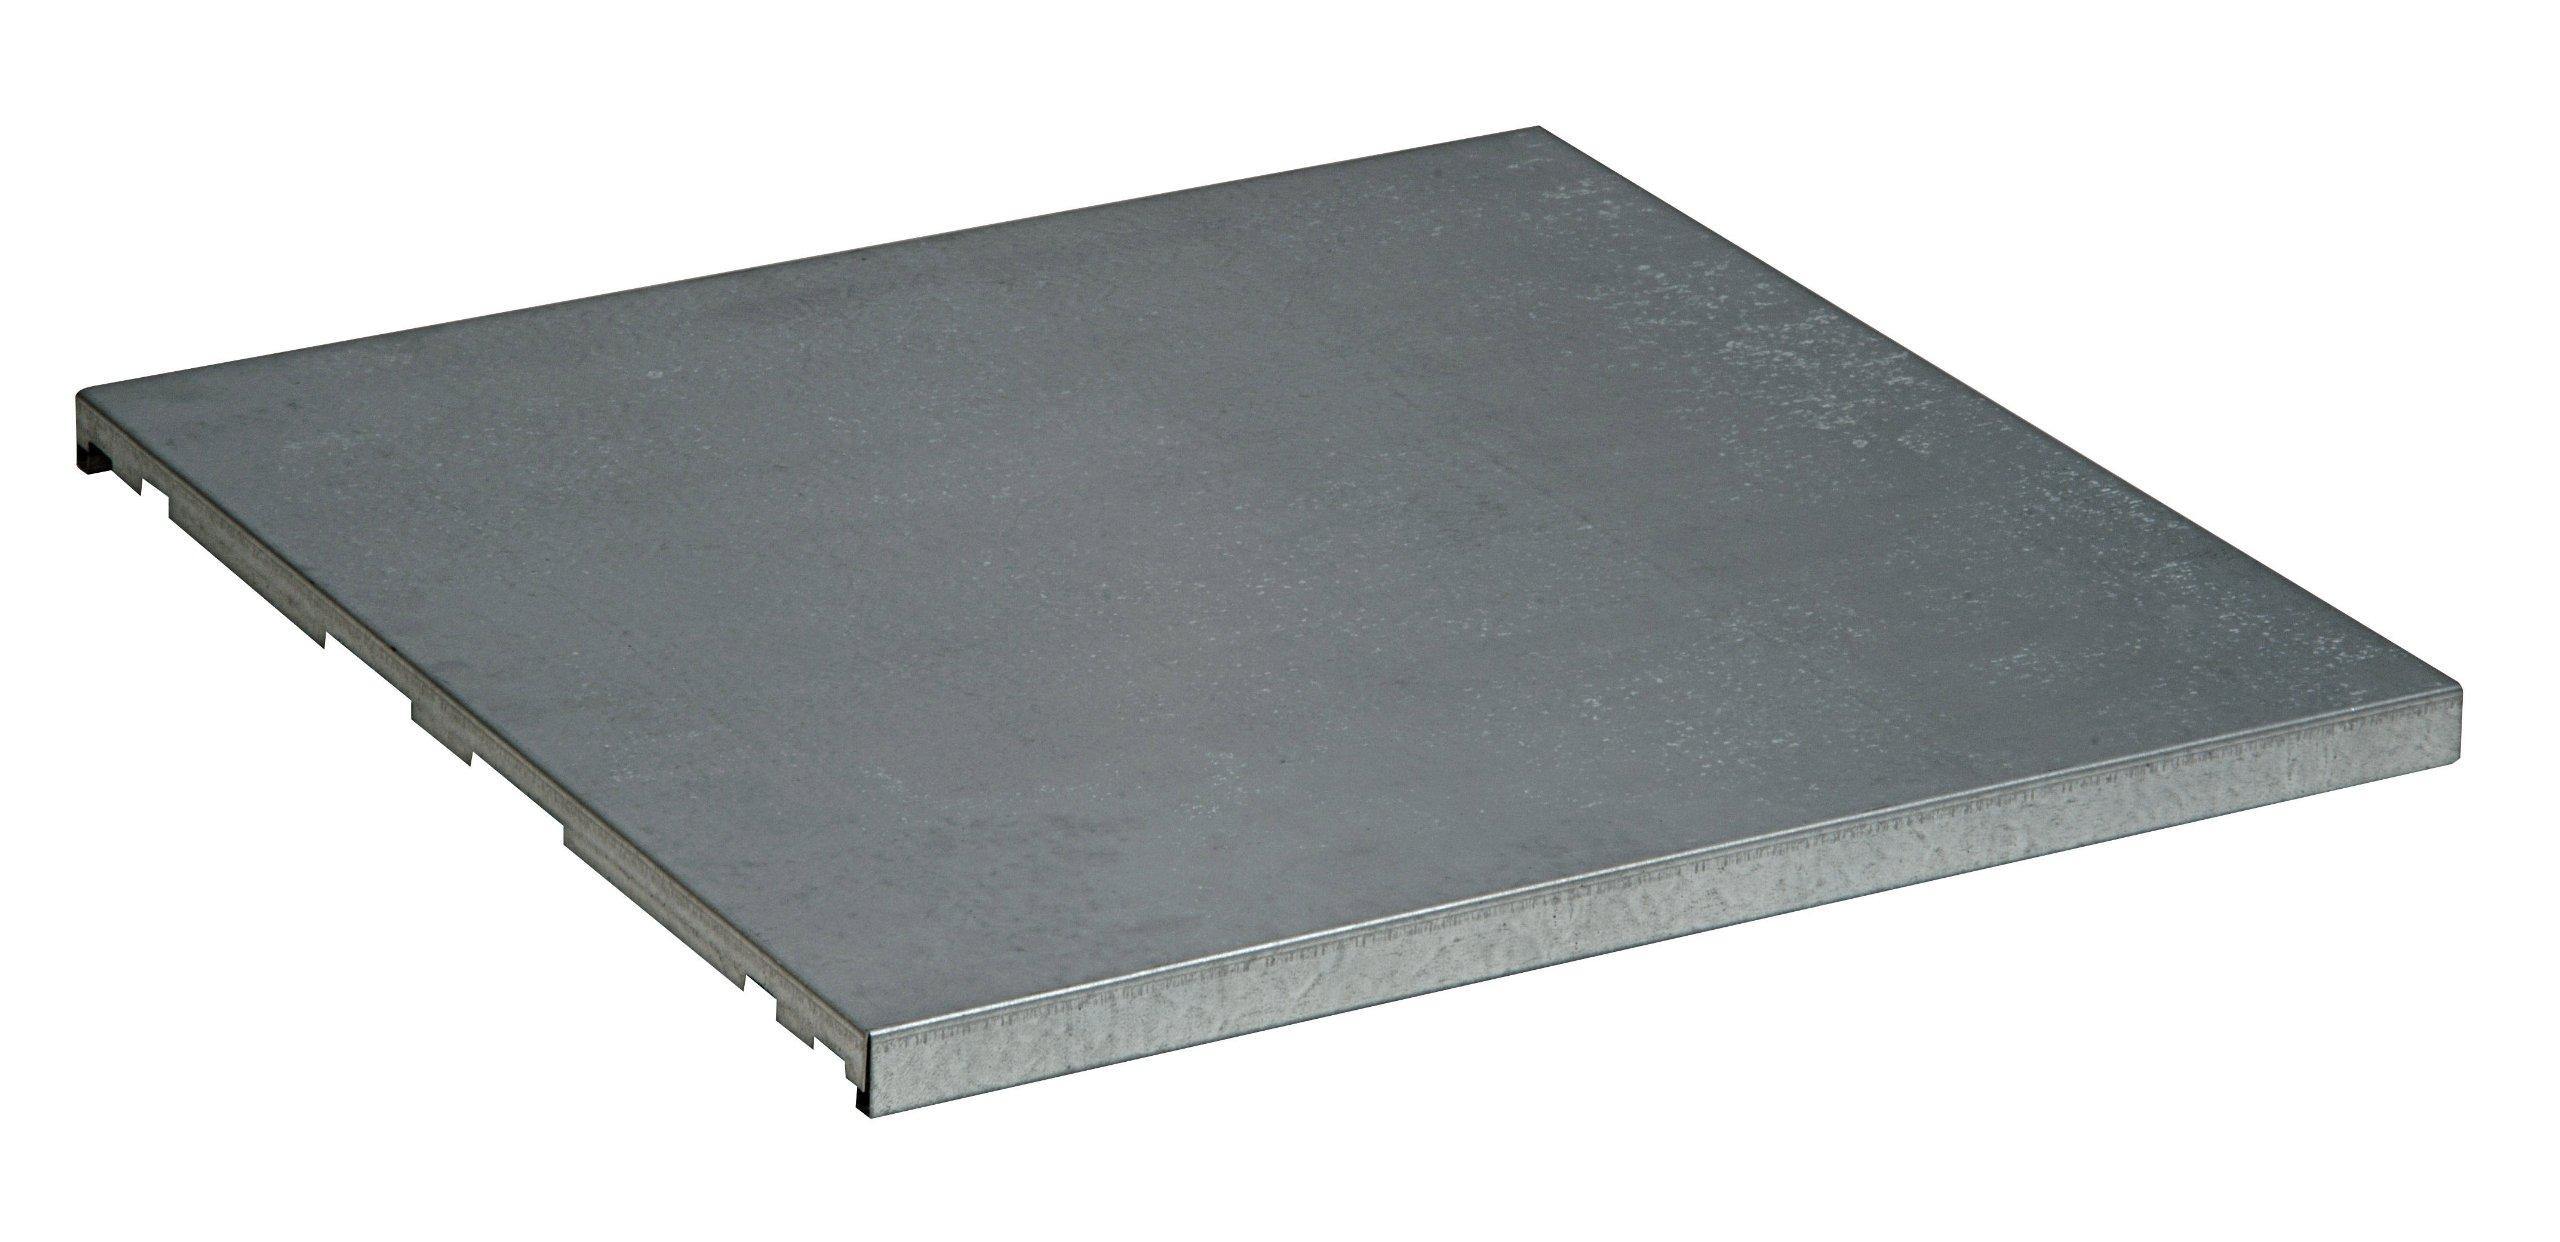 Justrite 29944 Spill Slope 30.375'' x 29'' (L x W) Shelf Cabinet Accessories